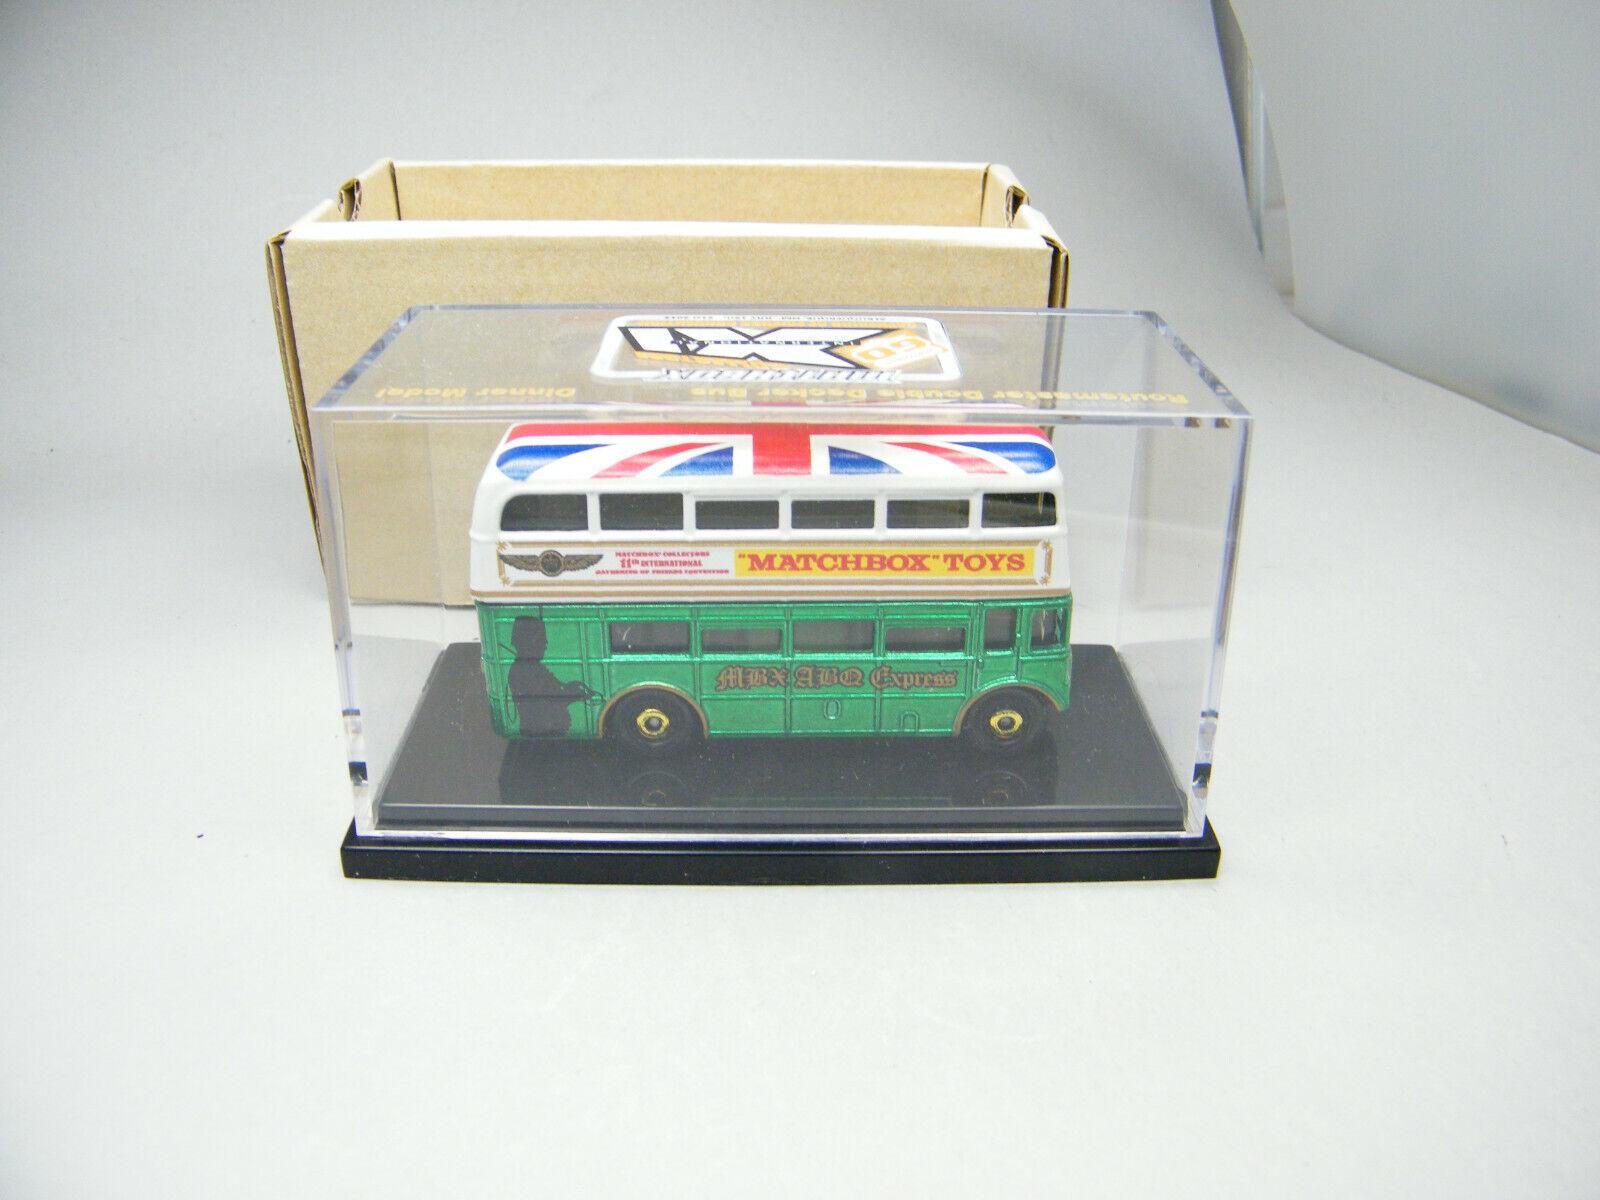 tienda de ventas outlet Matchbox Albuquerque mcch London London London biplano-bus verde 2013-muy buscada   hasta un 60% de descuento